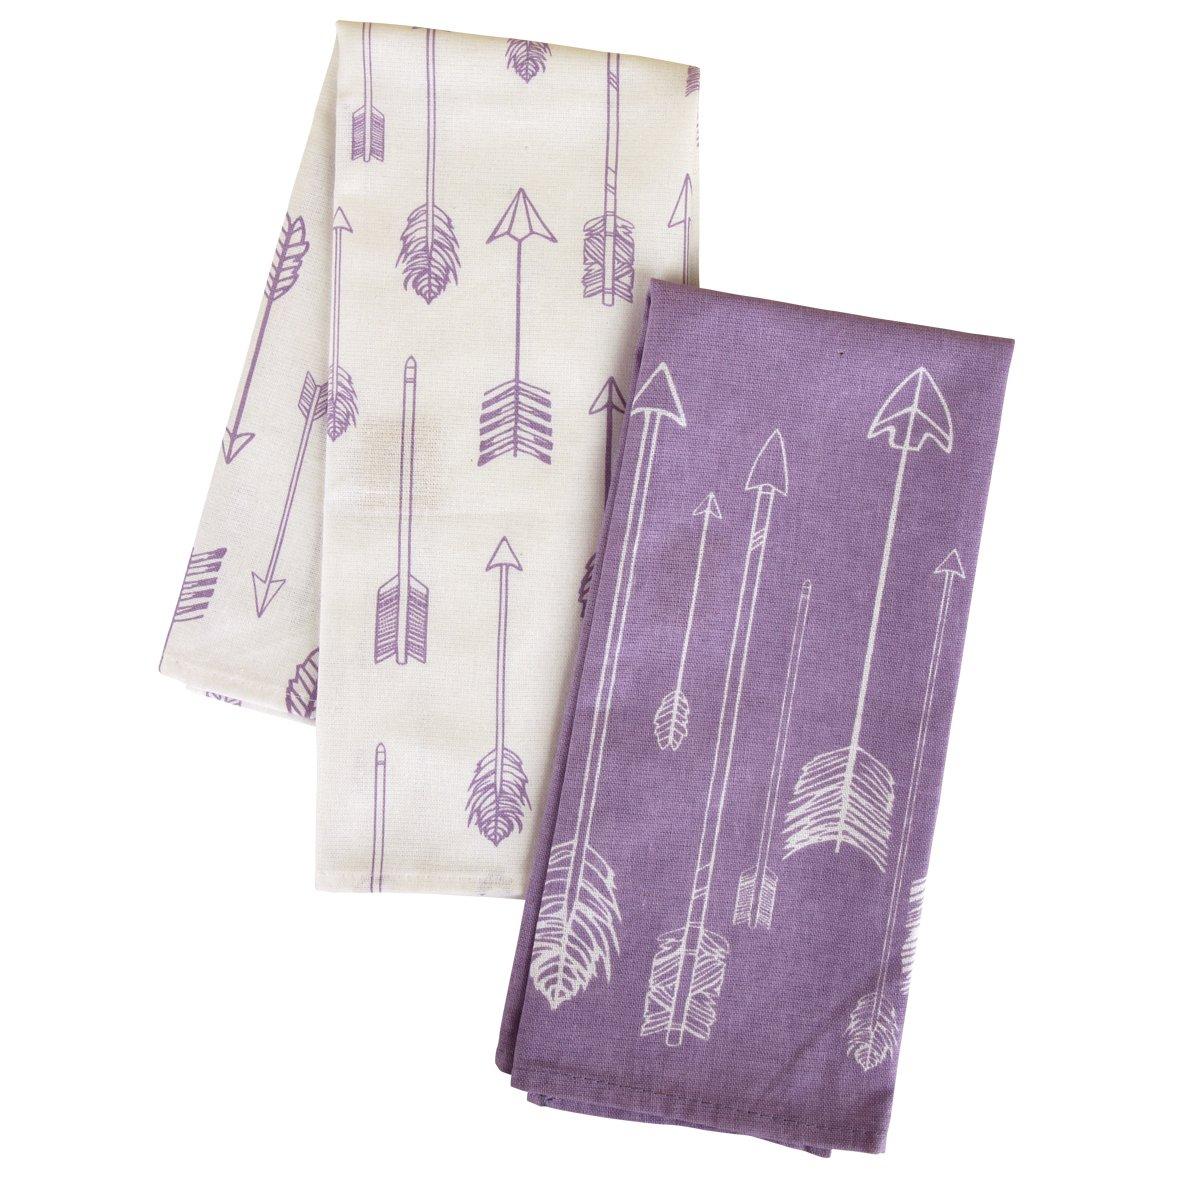 Karma Gifts Tea Towels (Set of 2), Arrows